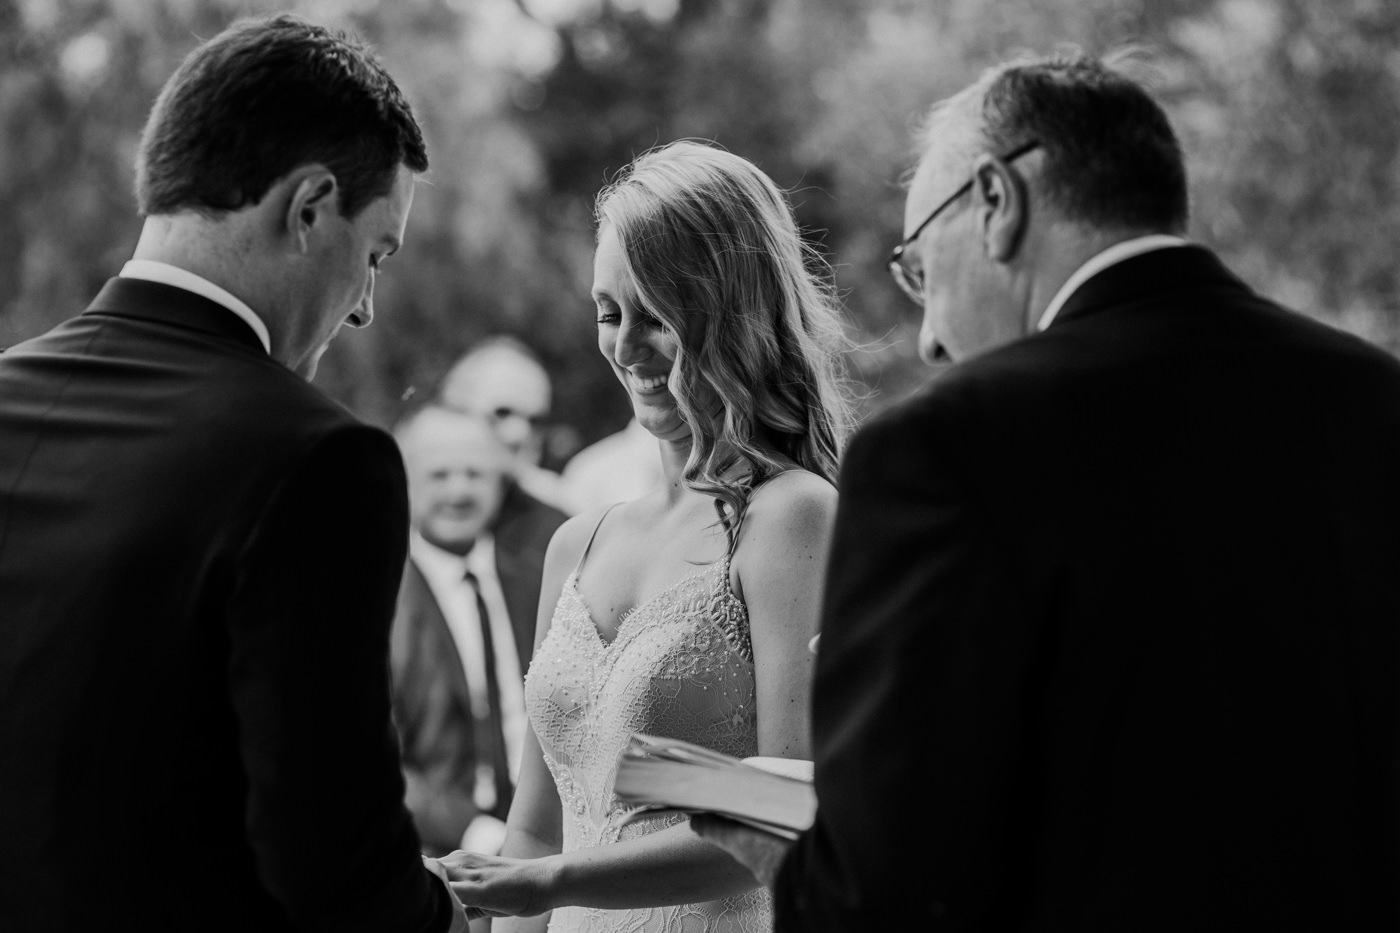 Anthony & Eliet - Wagga Wagga Wedding - Country NSW - Samantha Heather Photography-105.jpg